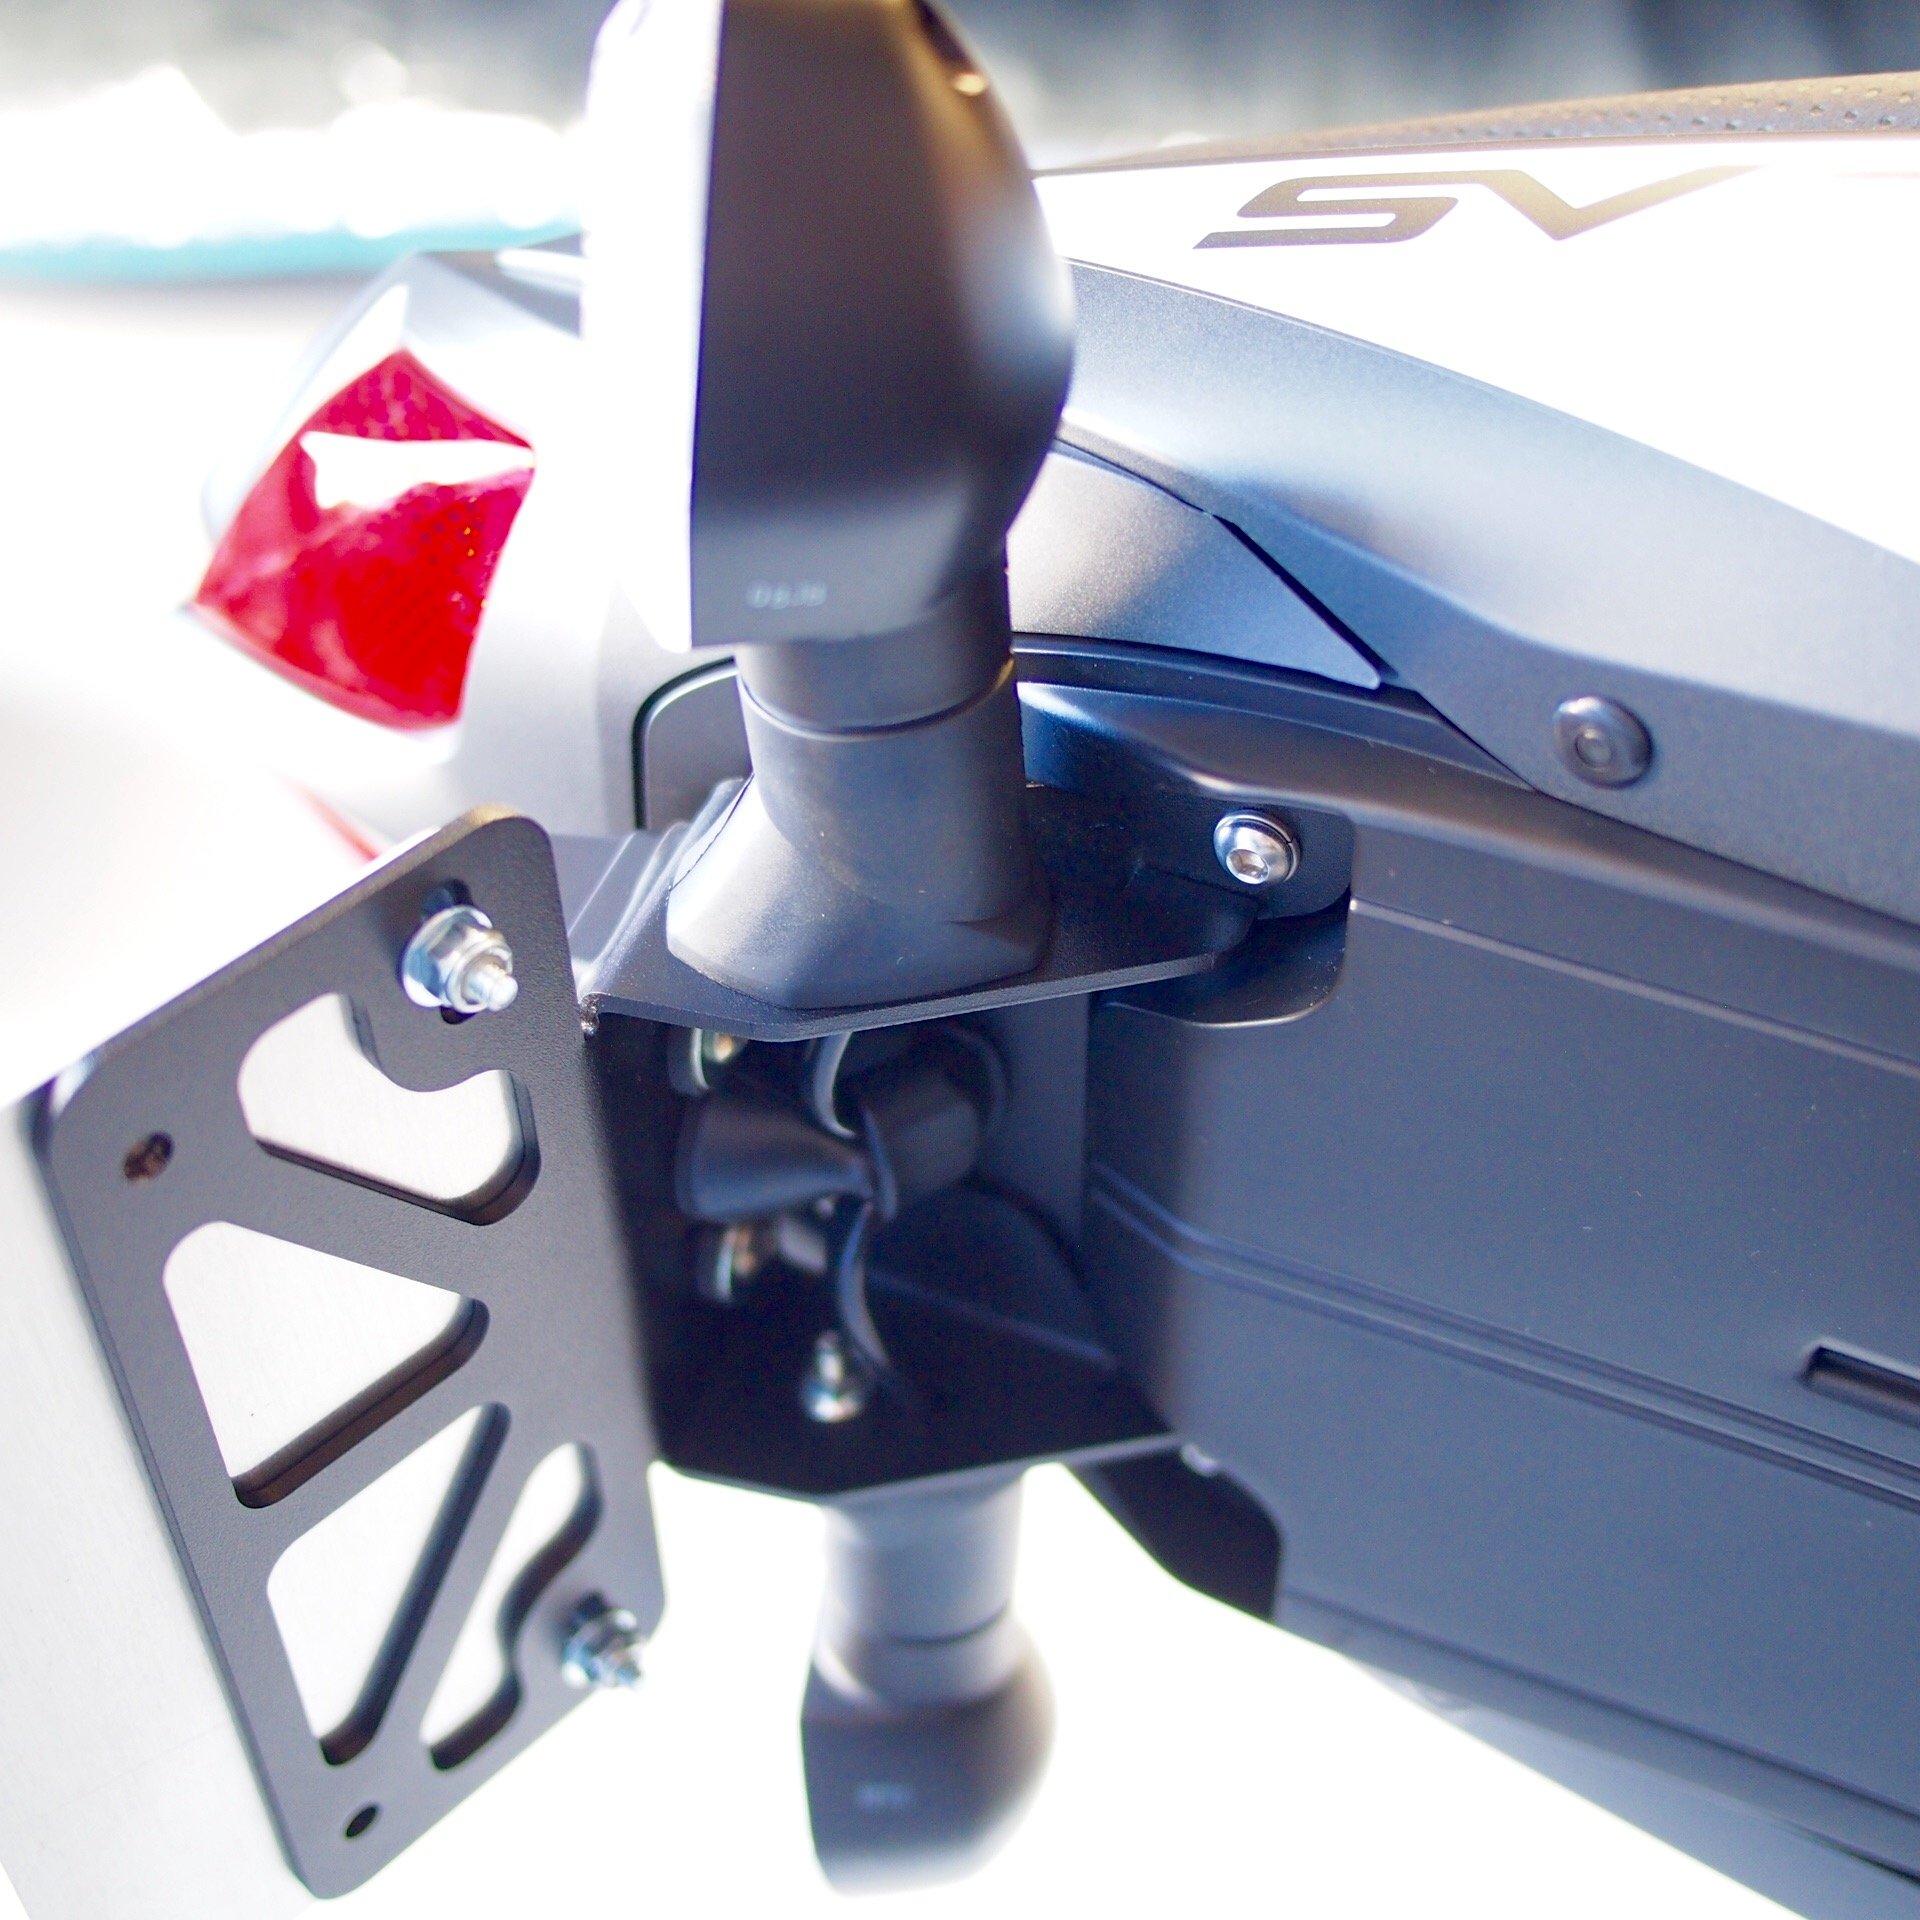 Vagabond Motorsports Suzuki SV650 VM-SV610 Fender Eliminator by Vagabond Motorsports (Image #2)